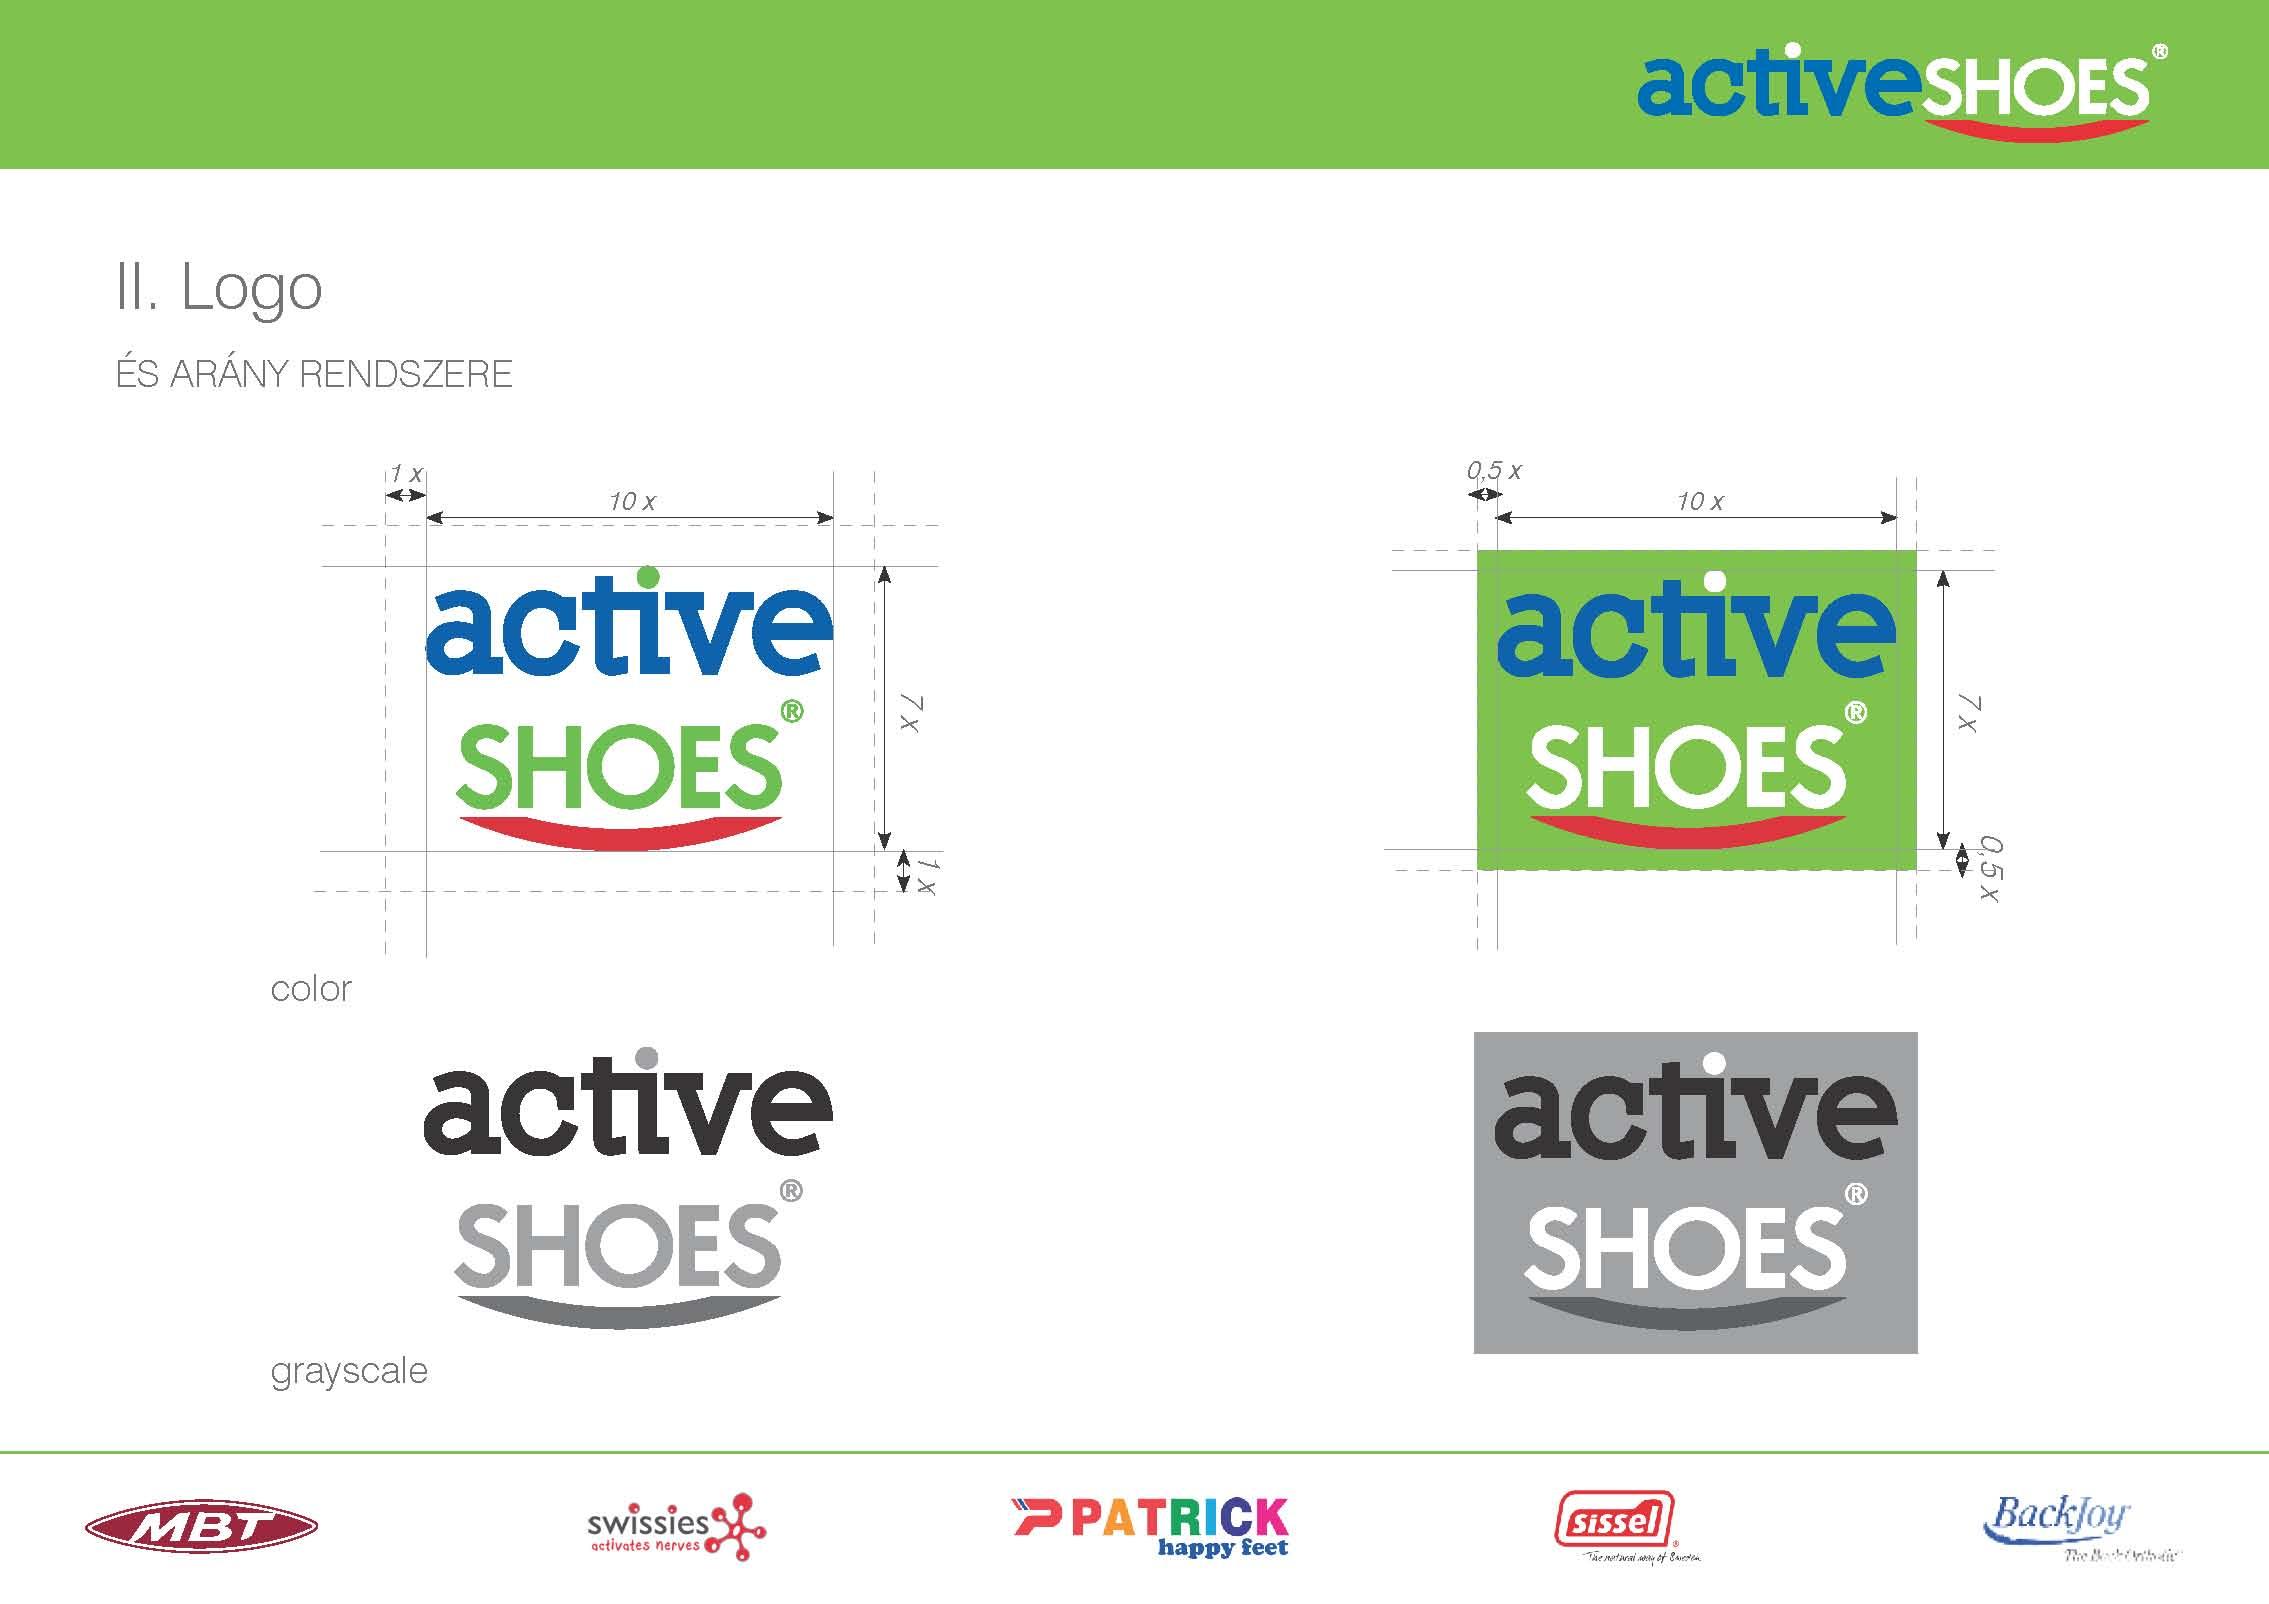 activeshoes_designbook_2011_07_A4-es_4_Page_04